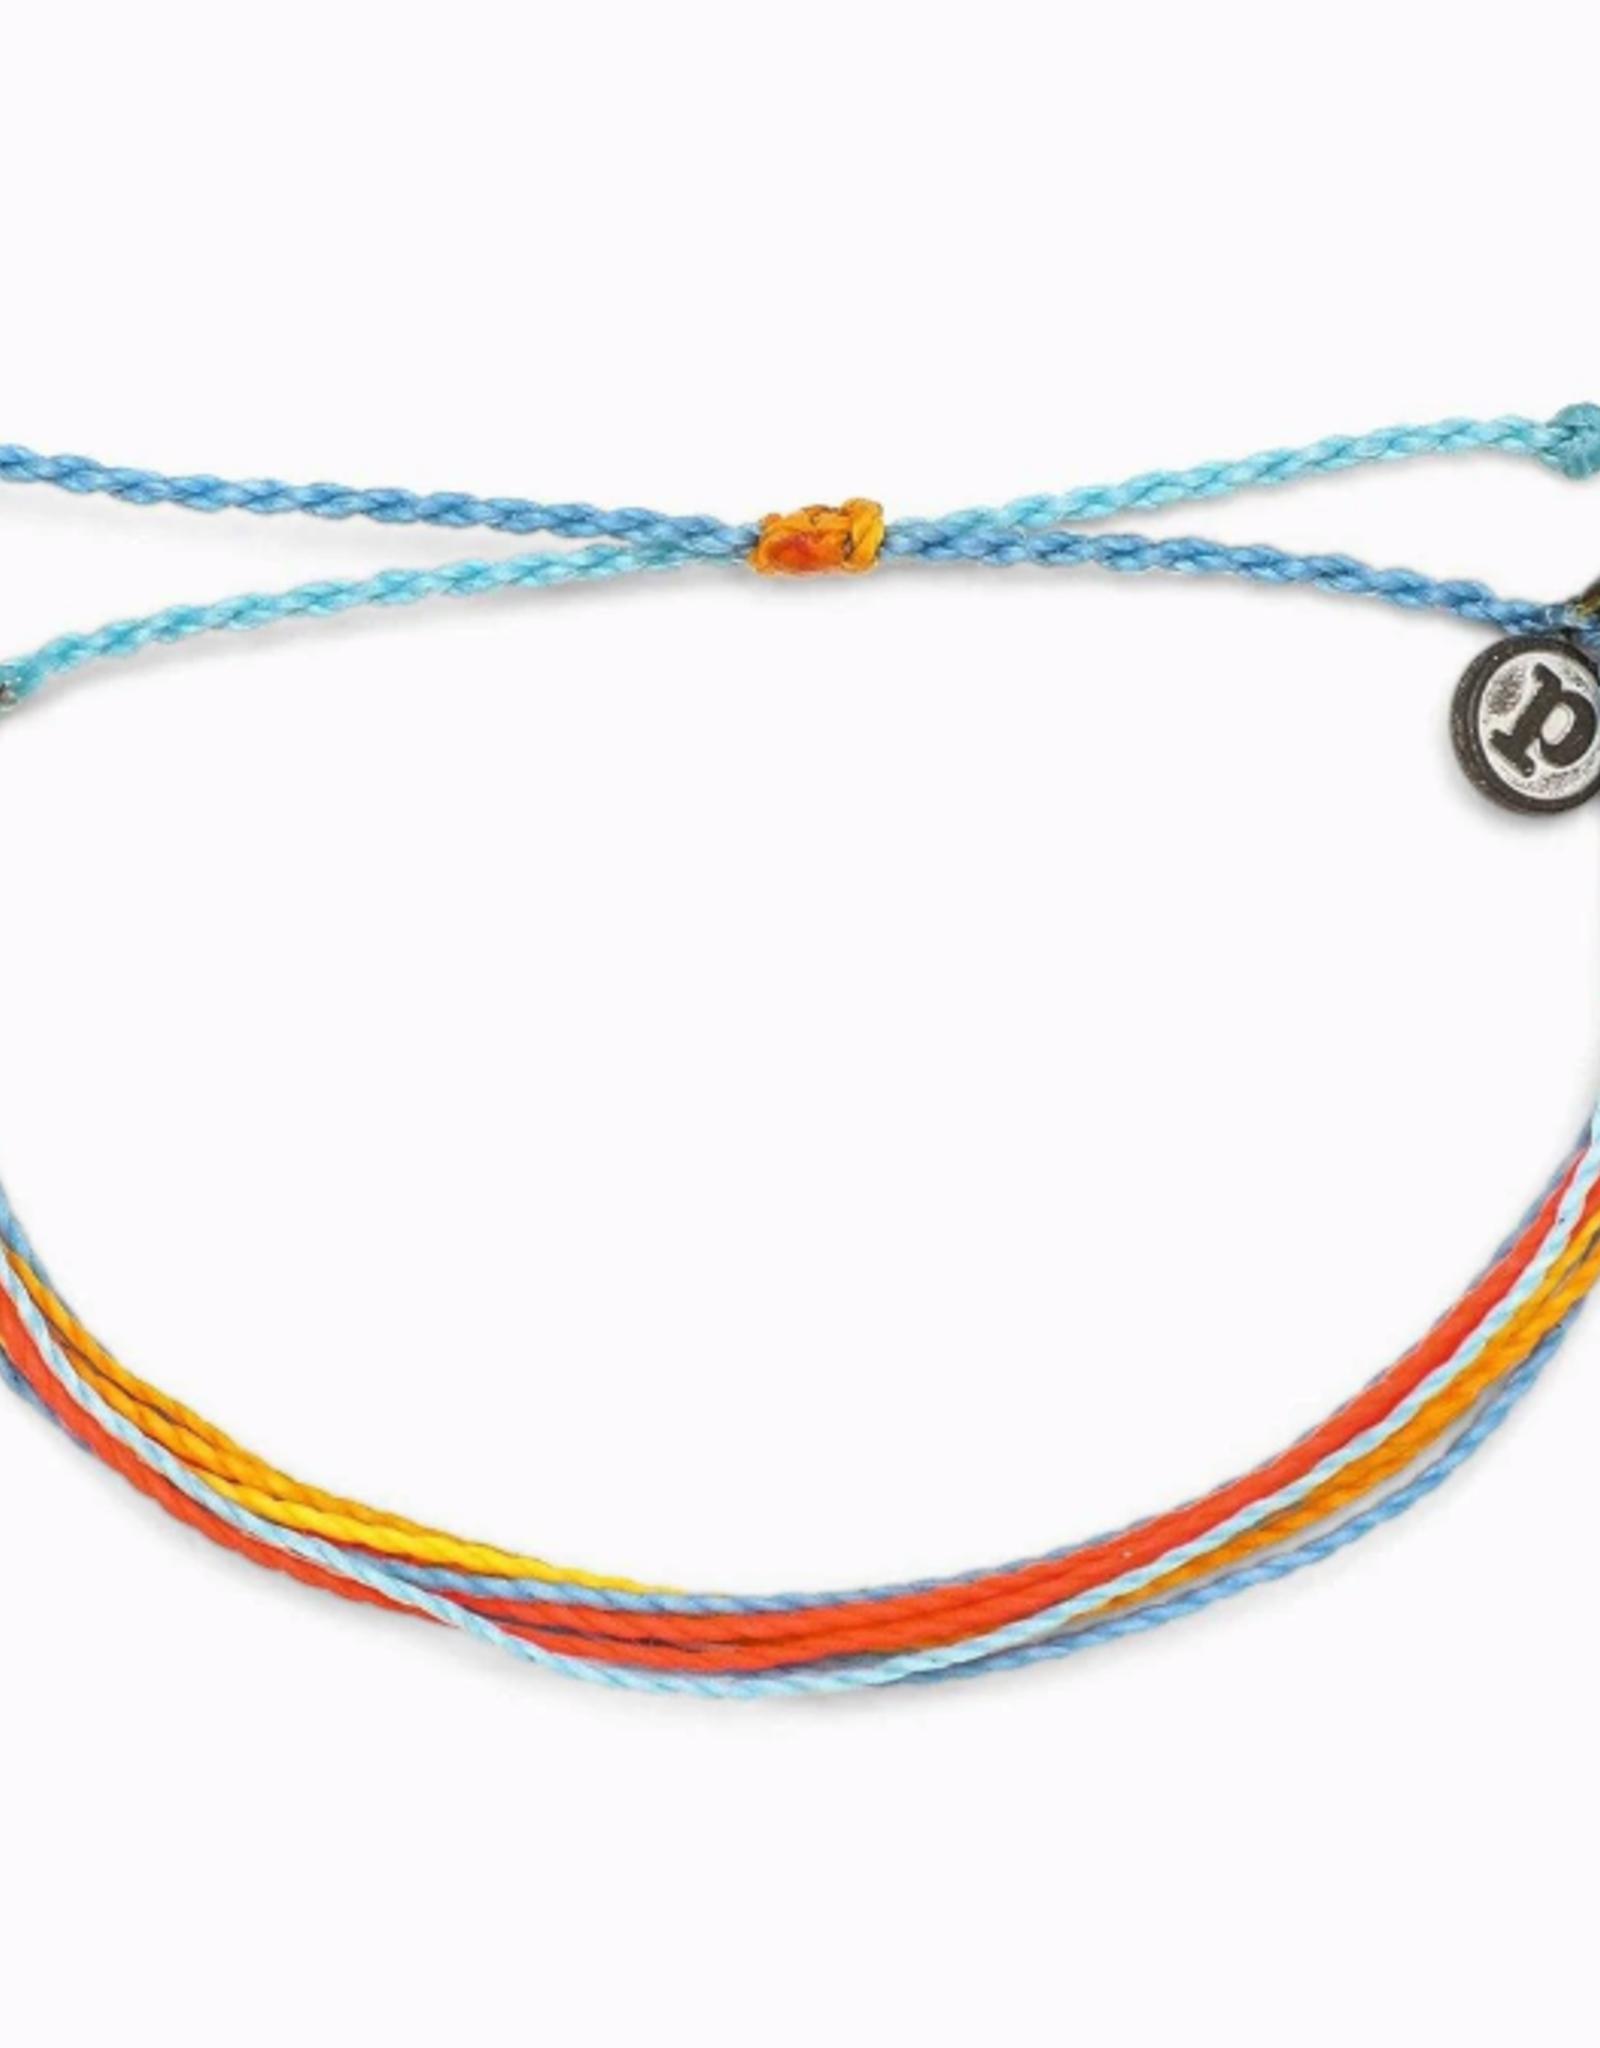 Puravida Puravida - Bright Original Citrus Surfline Bracelet